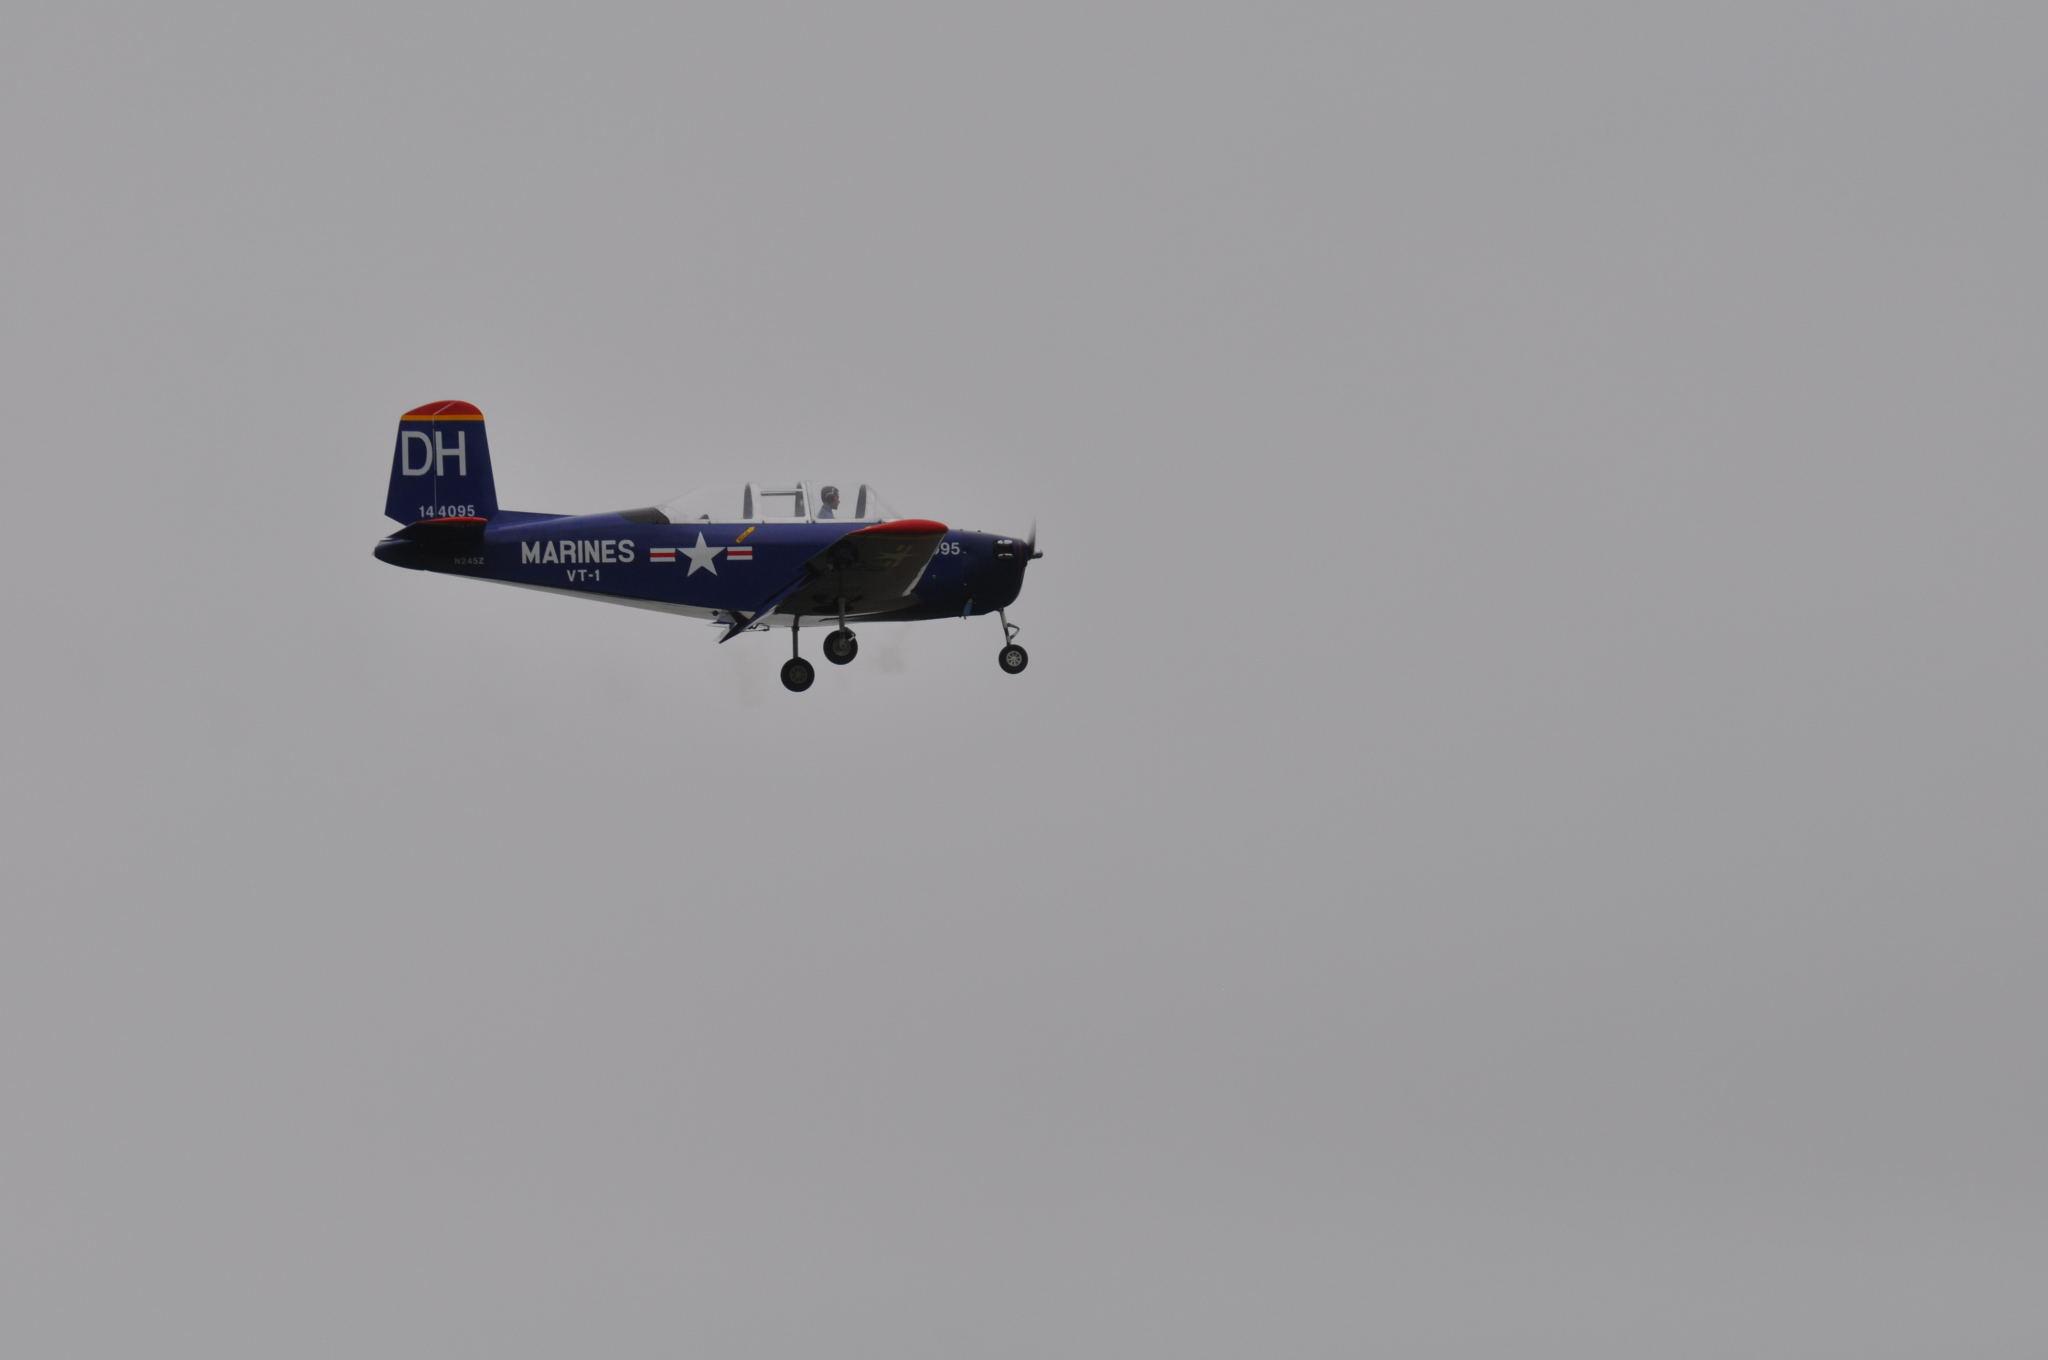 DSC_9329.JPG